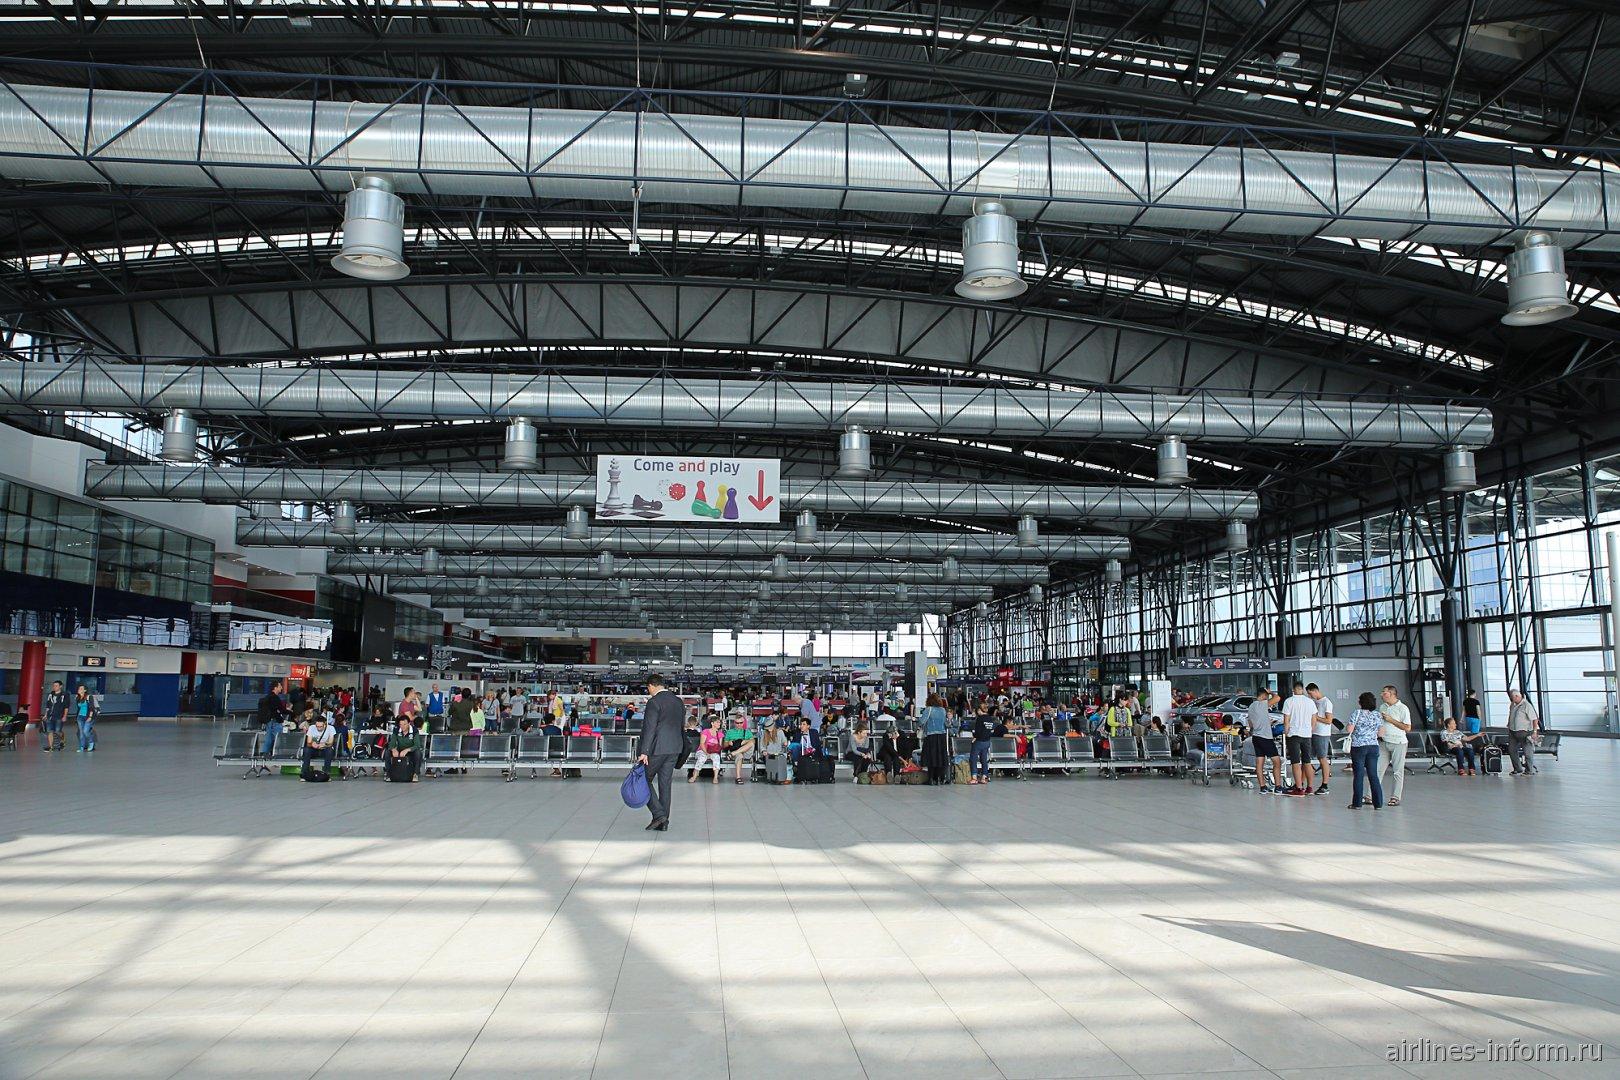 В терминале 2 аэропорта Прага Вацлав Гавел